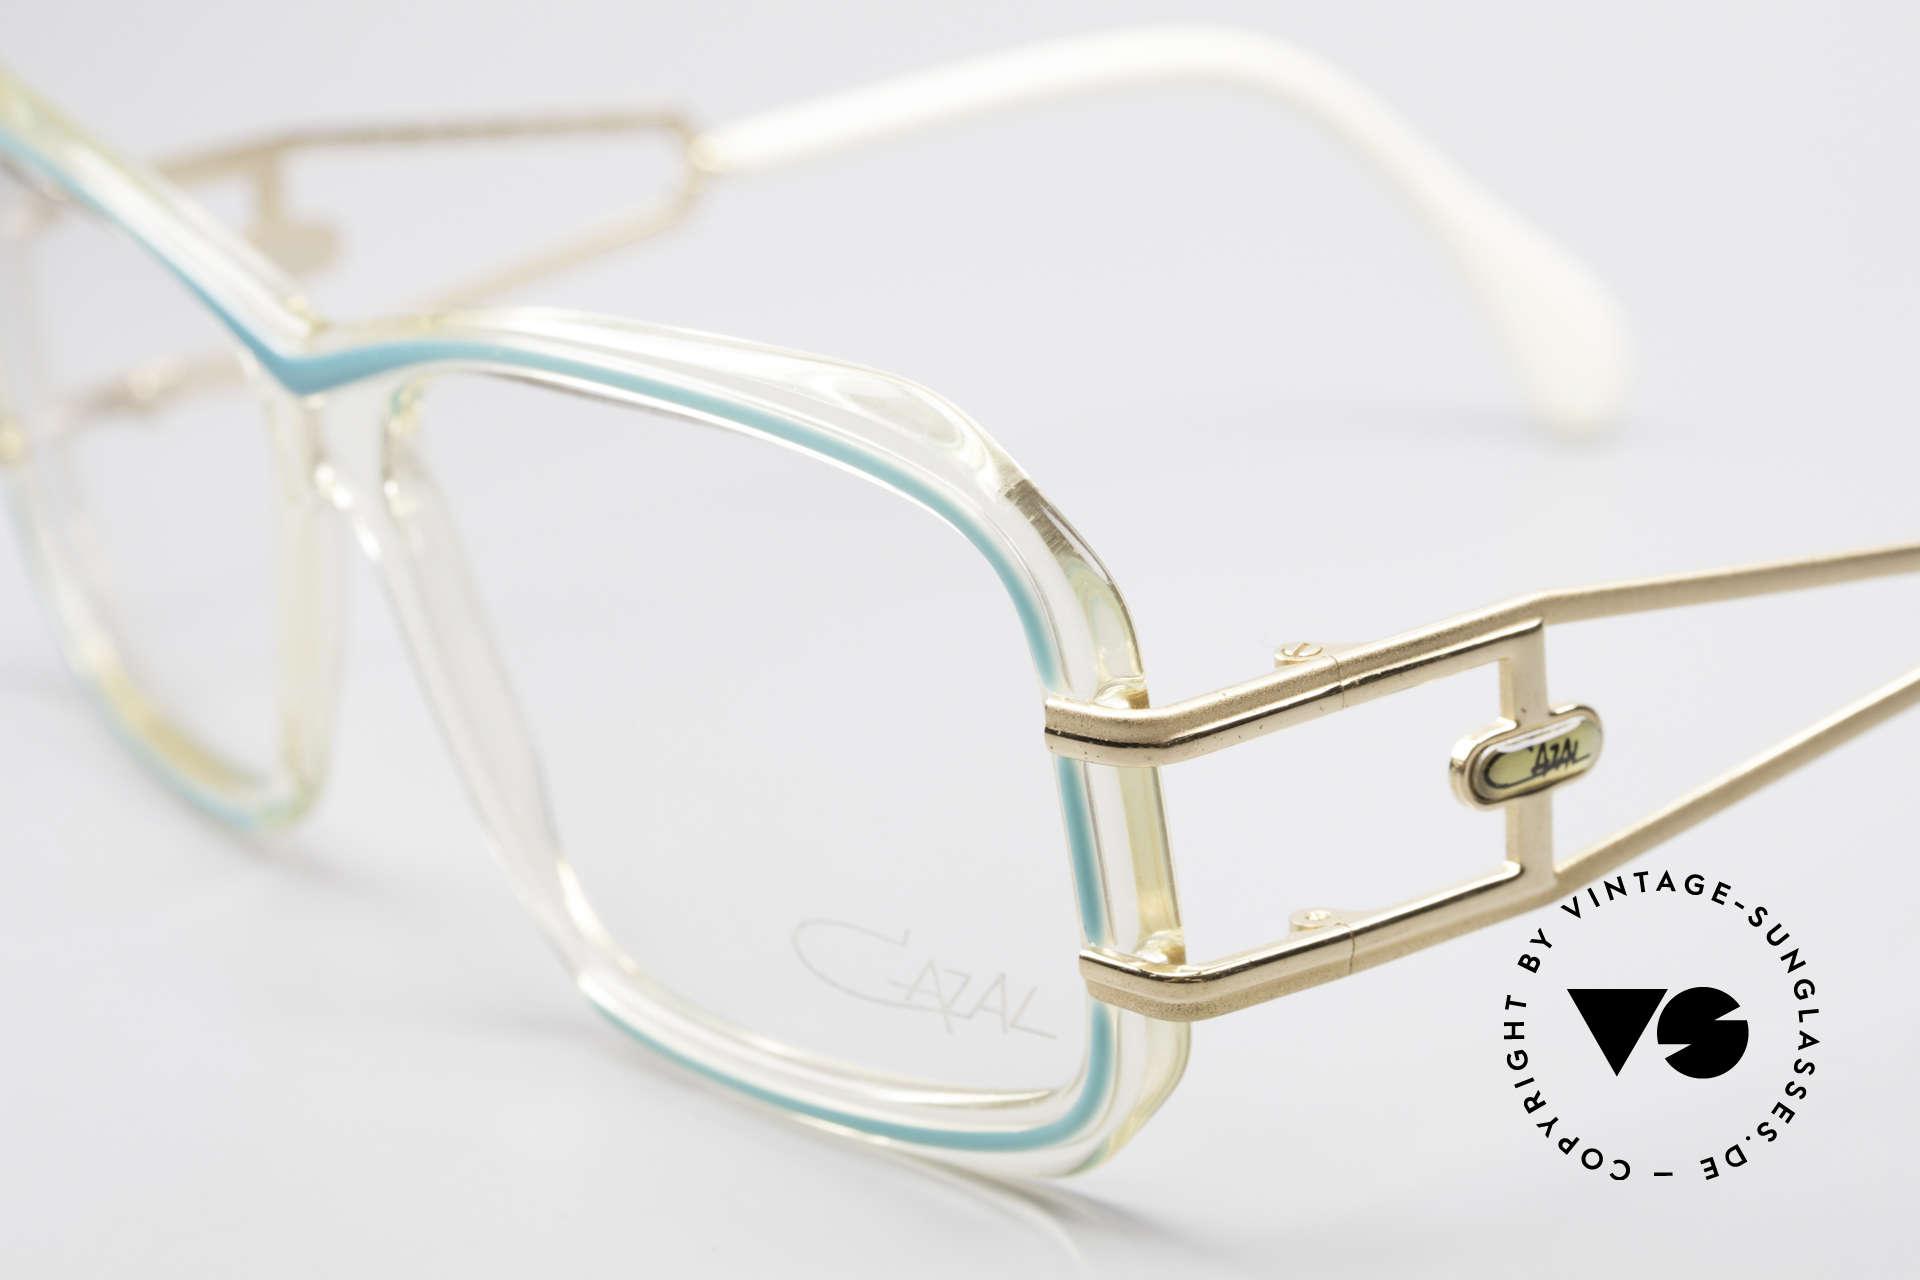 Cazal 173 Hip Hop Cazal 80's Glasses, unworn (like all our rare vintage CAZAL eyewear), Made for Women